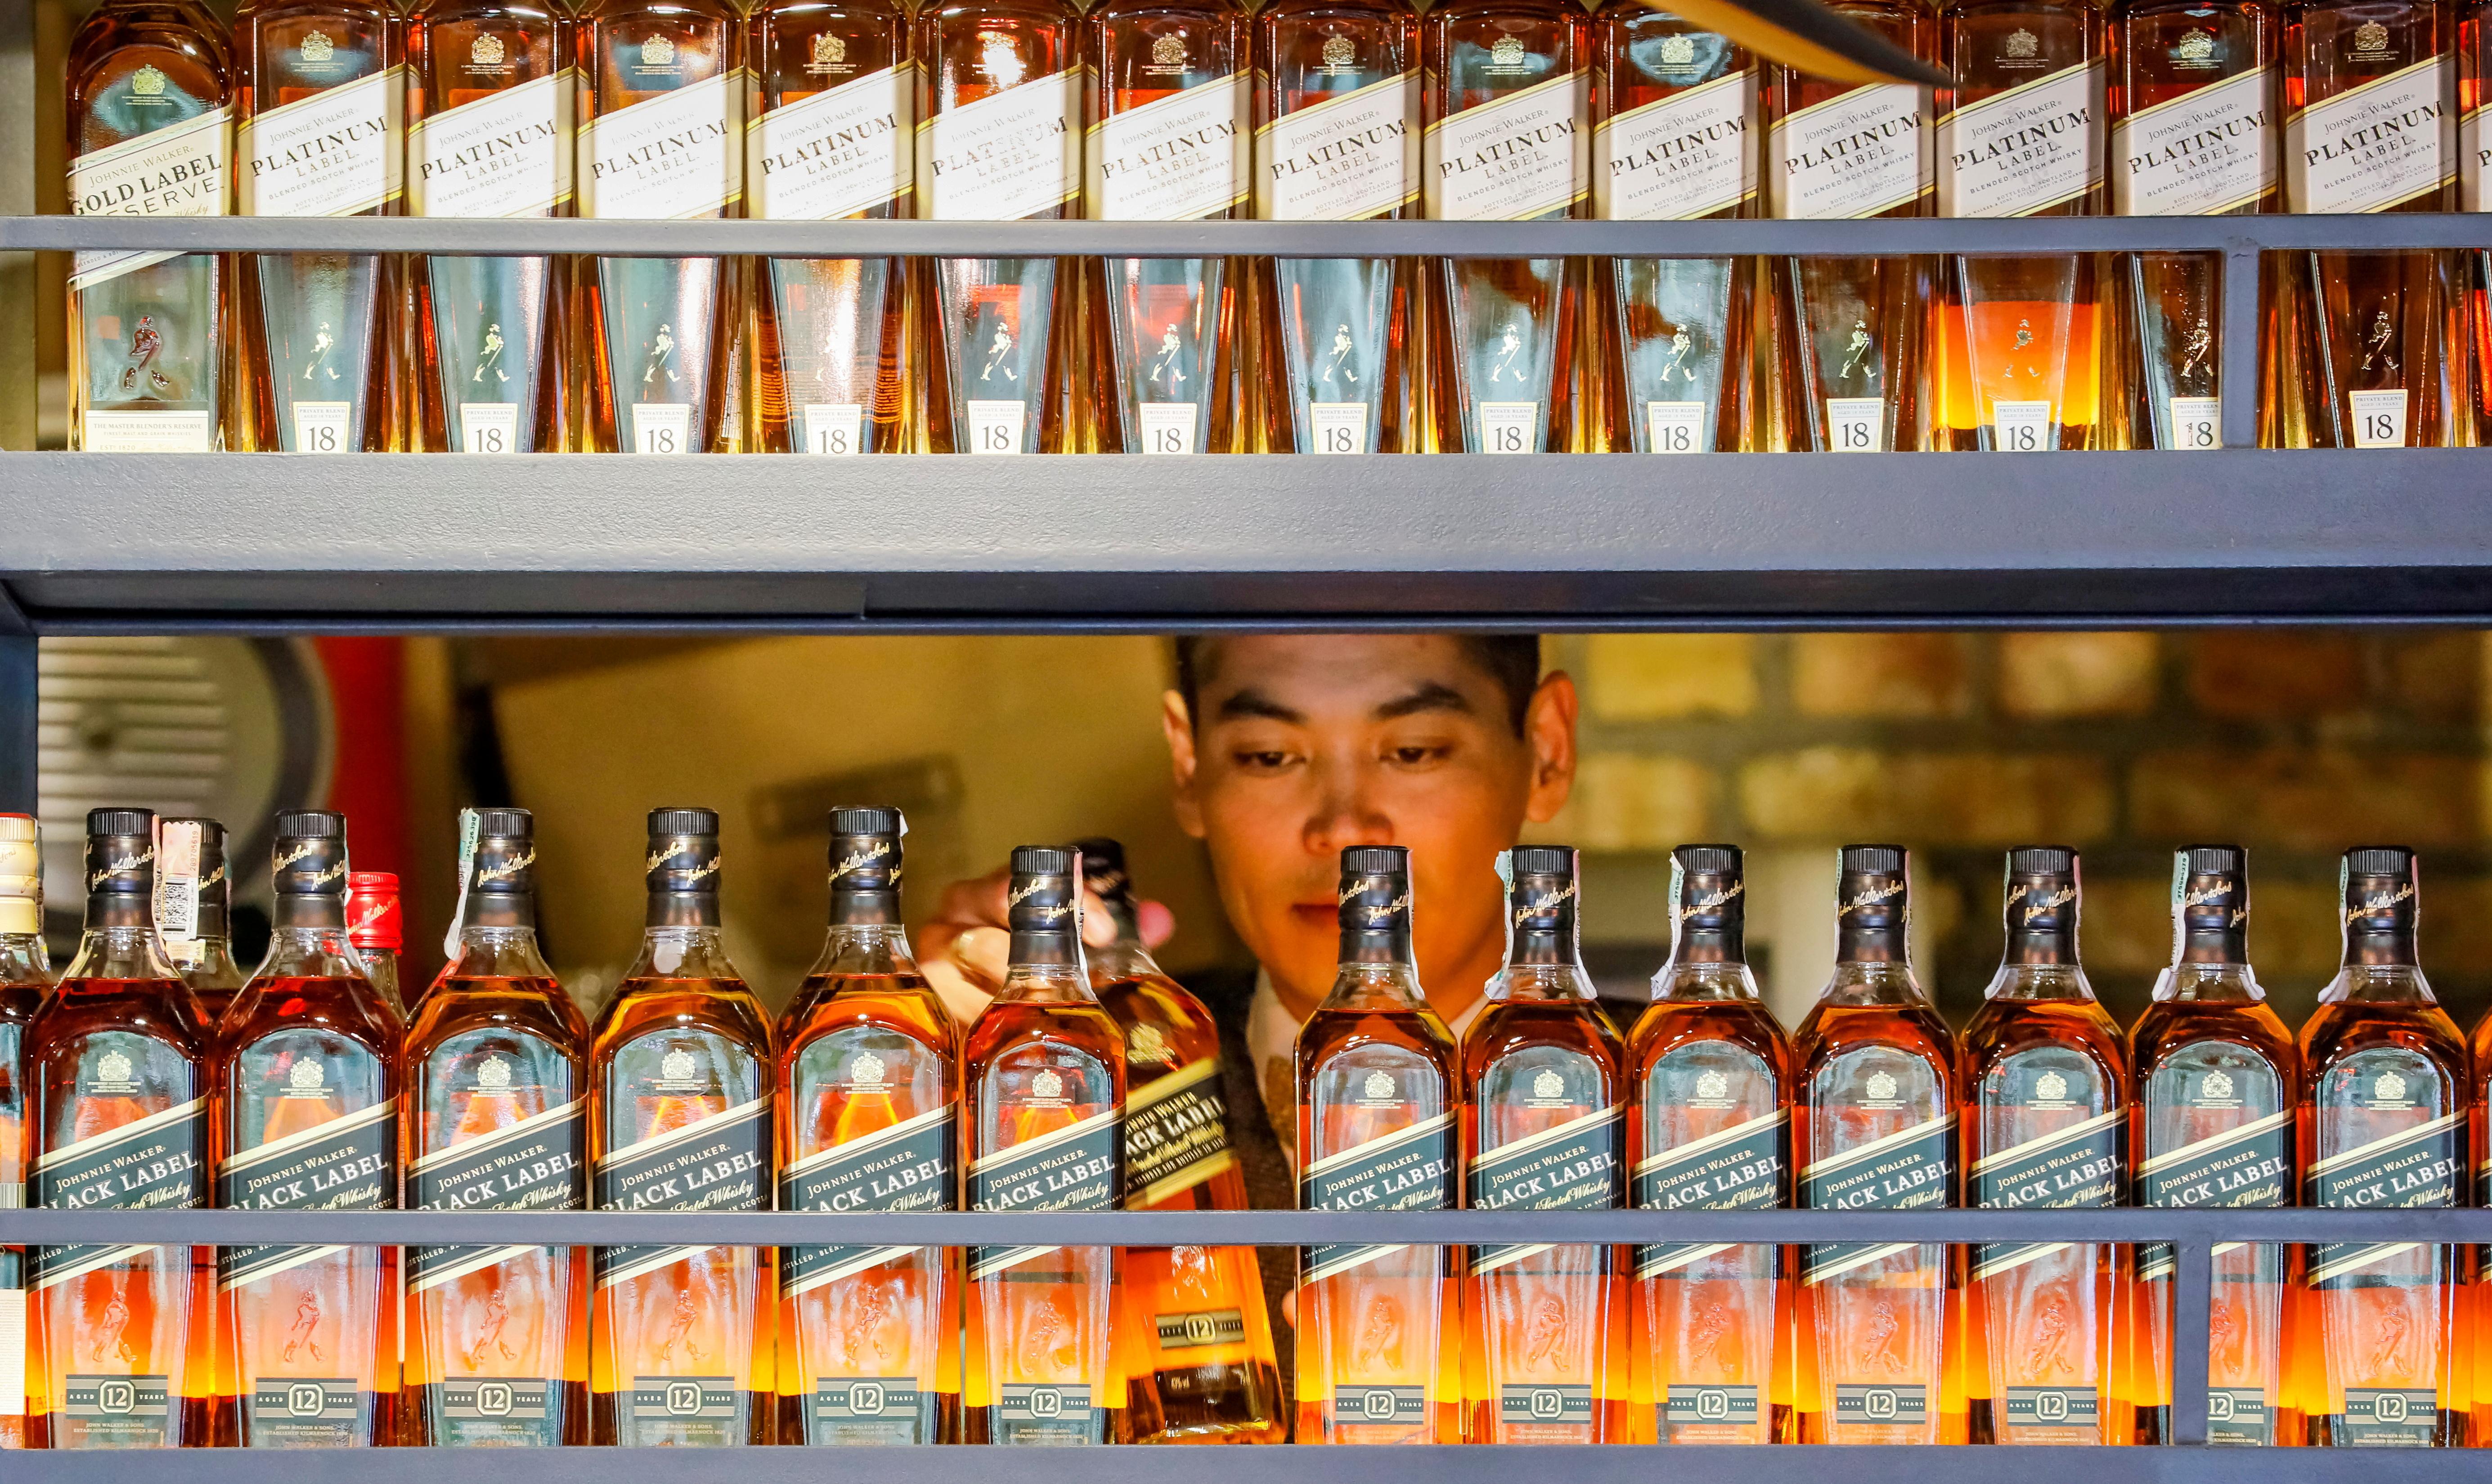 A bartender takes a bottle of Johnnie Walker whisky in Almaty, Kazakhstan June 22, 2017.  REUTERS/Shamil Zhumatov